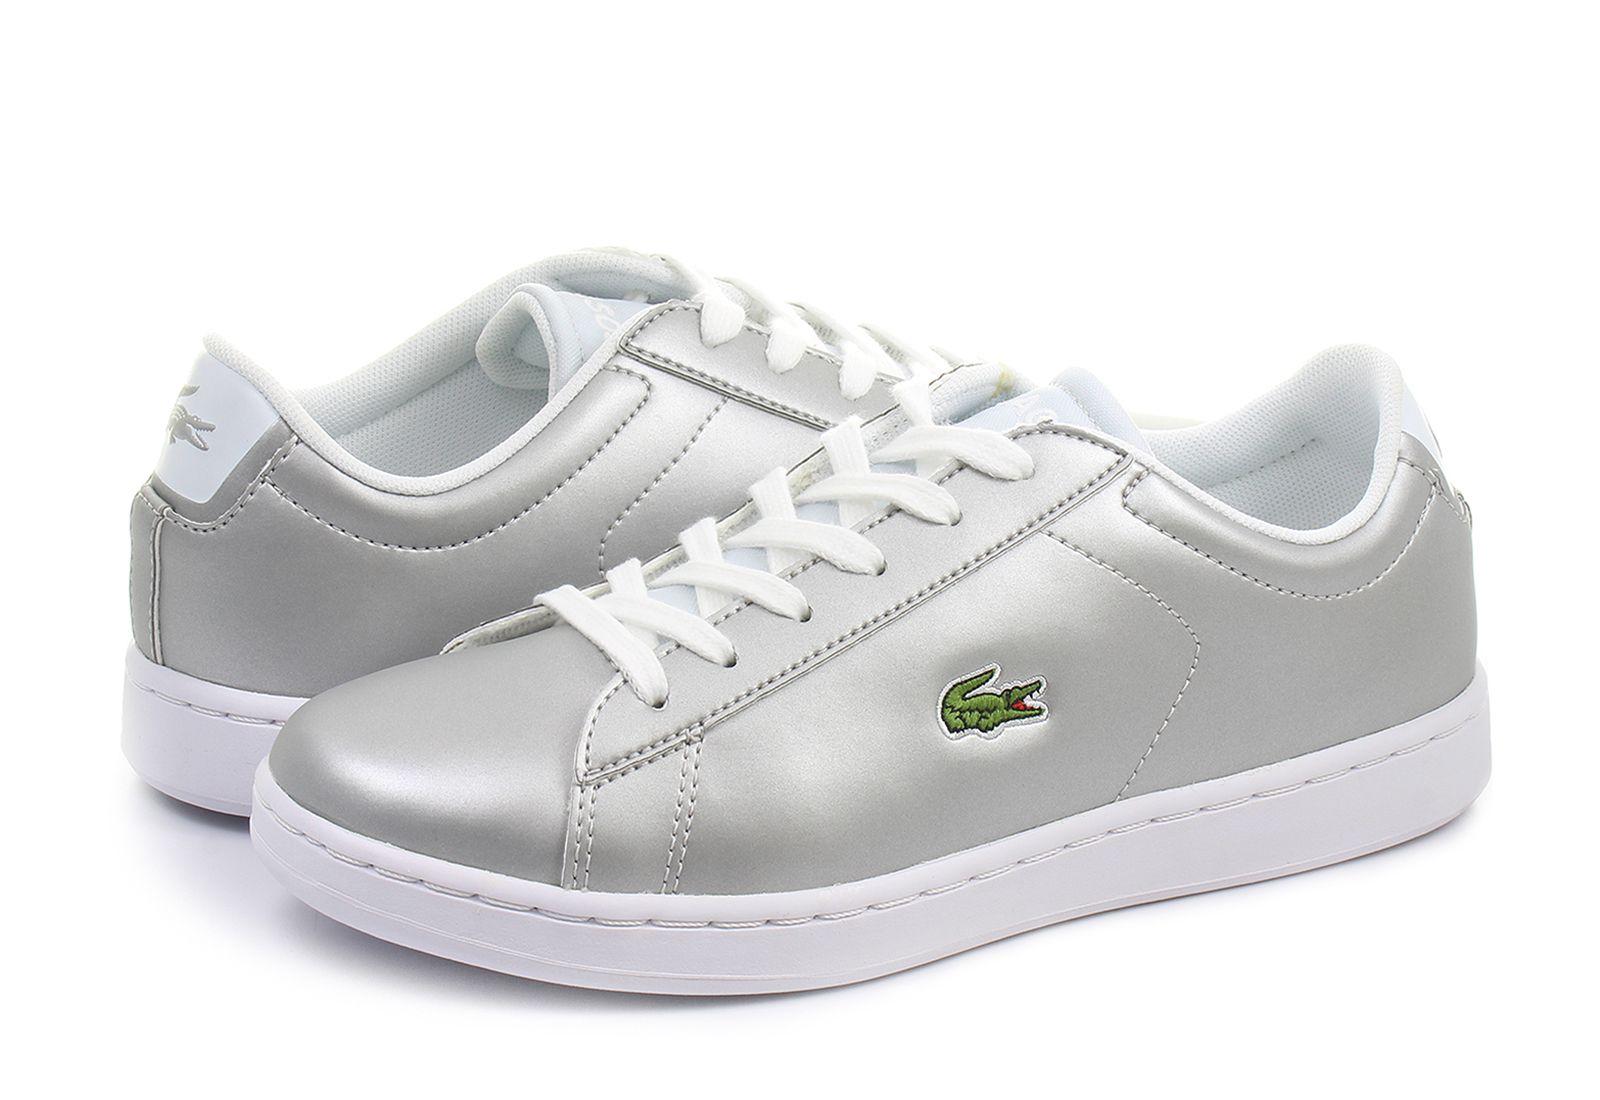 Lacoste Cipő - Carnaby Evo - 173SPJ0006-334 - Office Shoes ... a6daf5370e